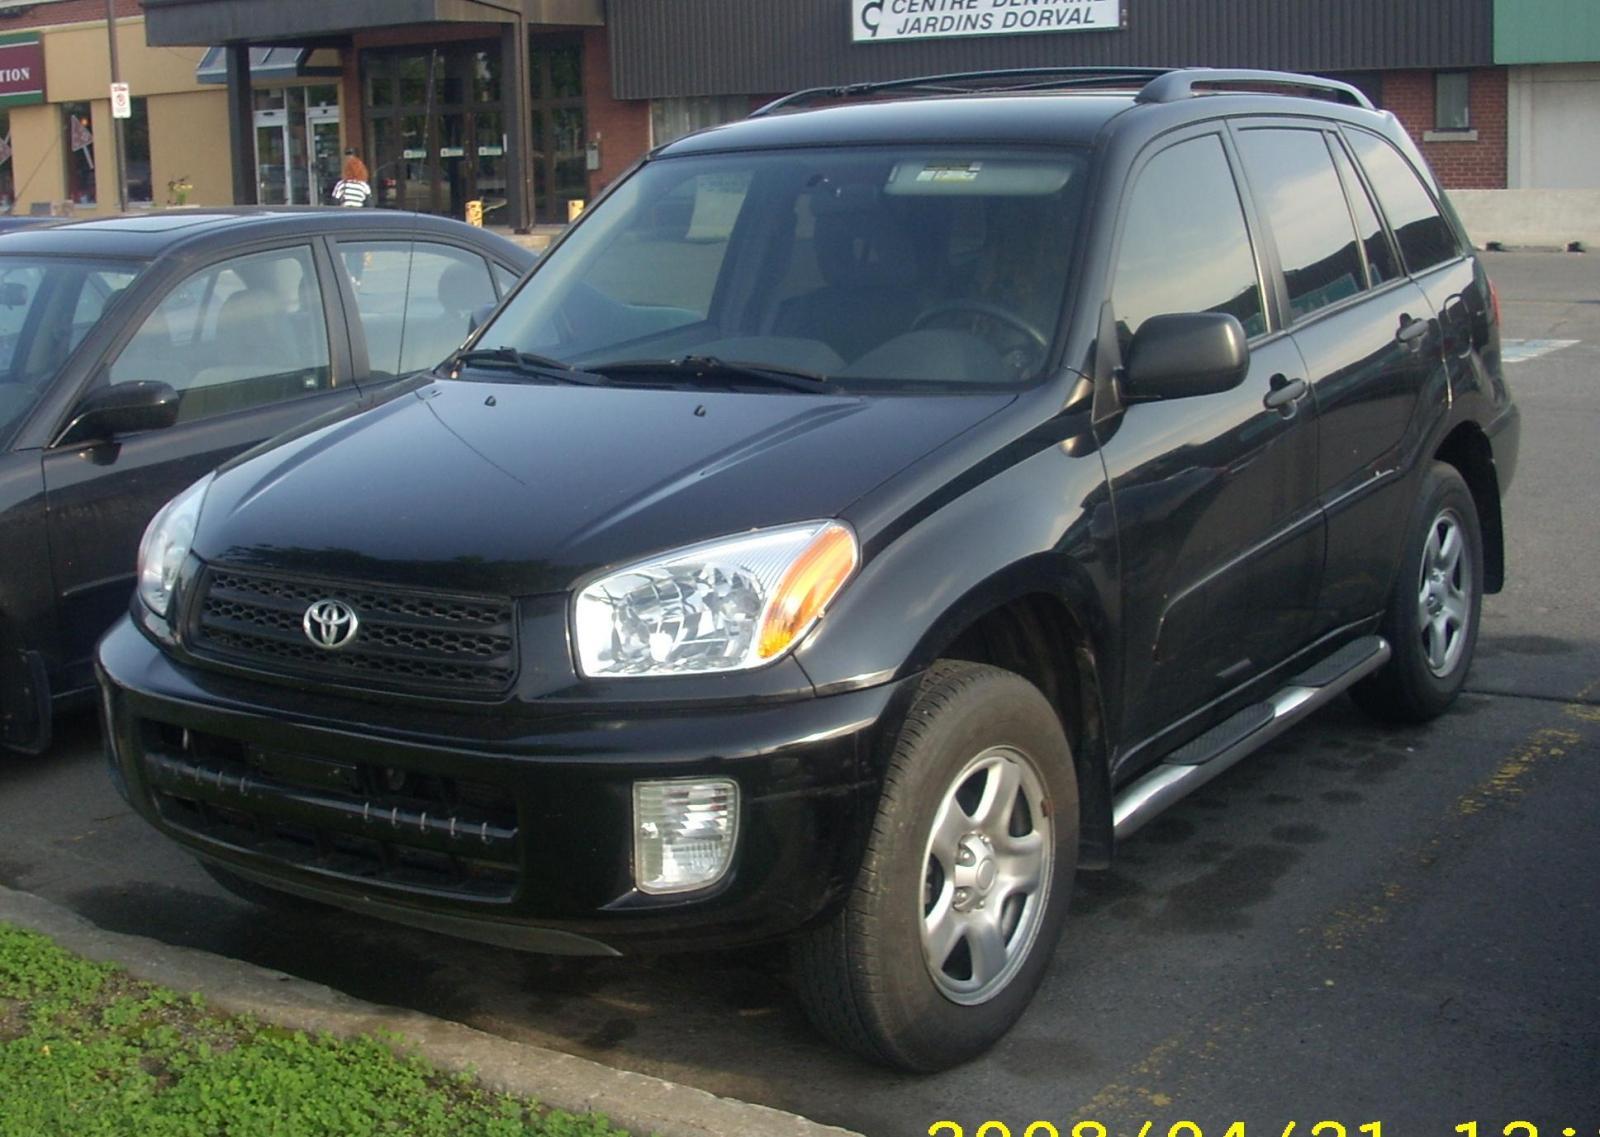 2001 Toyota Rav4 Information And Photos Zombiedrive Lights 800 1024 1280 1600 Origin